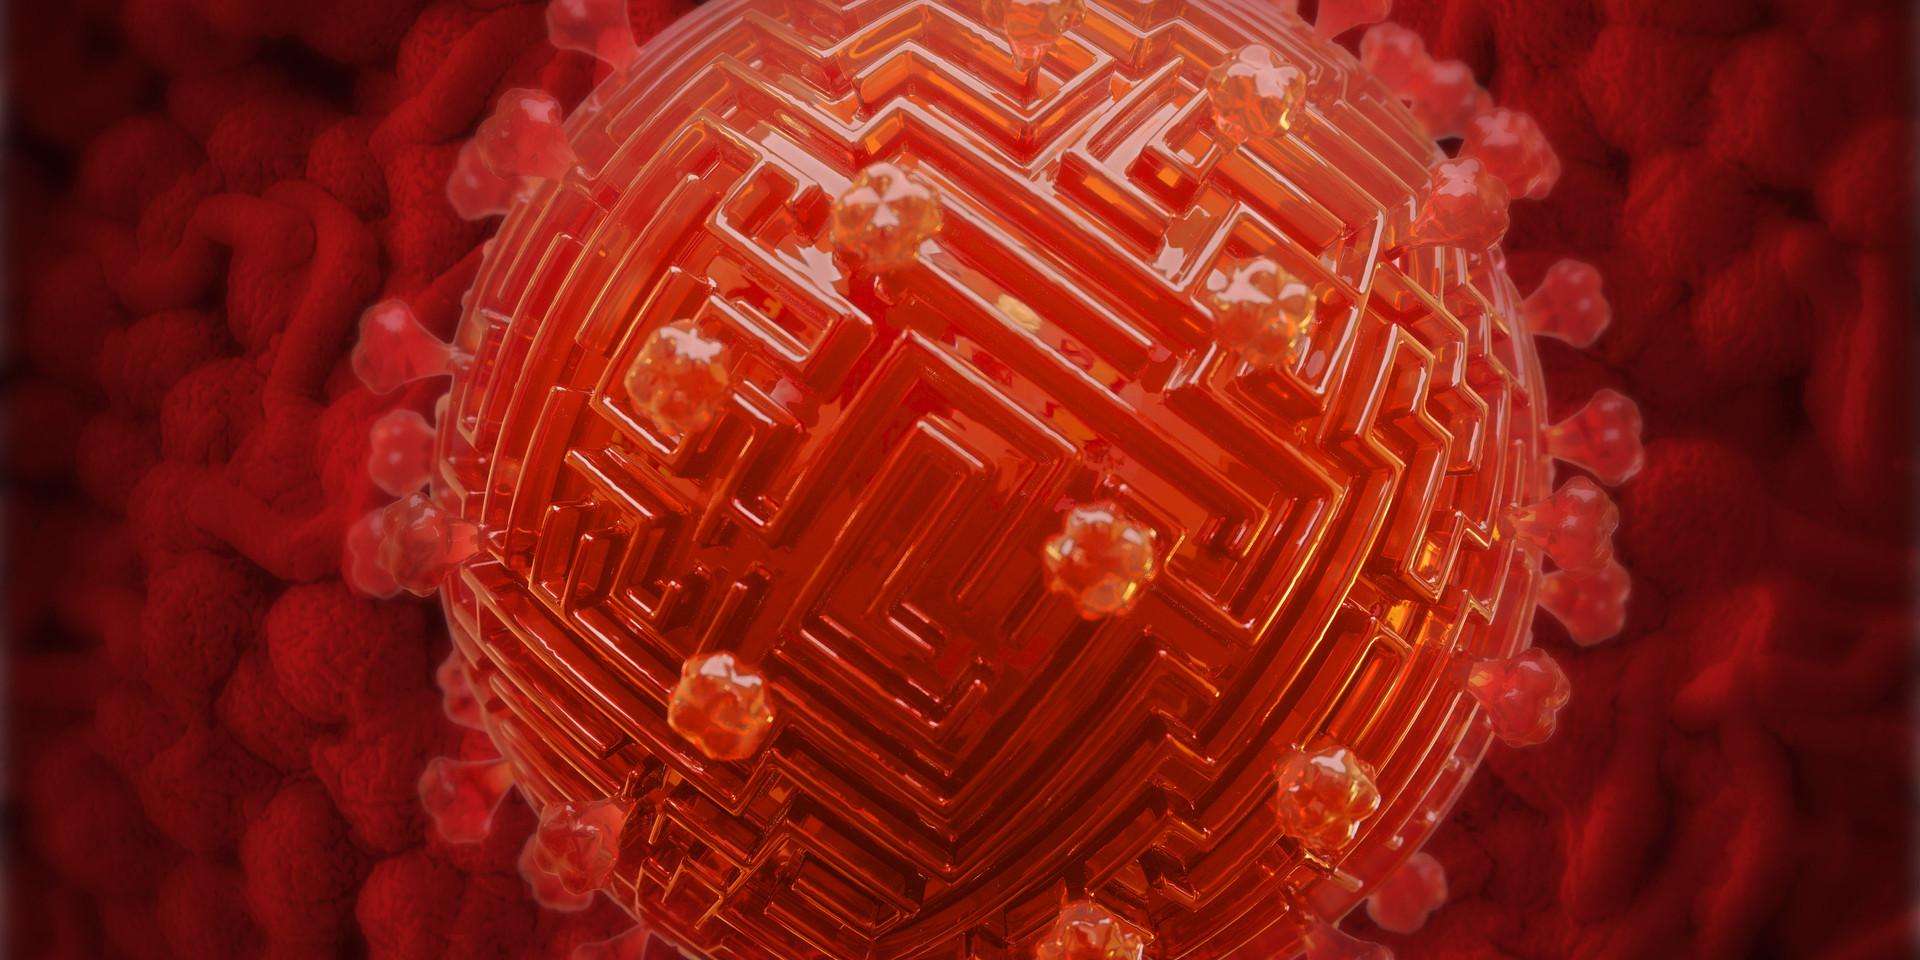 2020-03-30-Corona-Virus-maze-BLOOD-GLS -